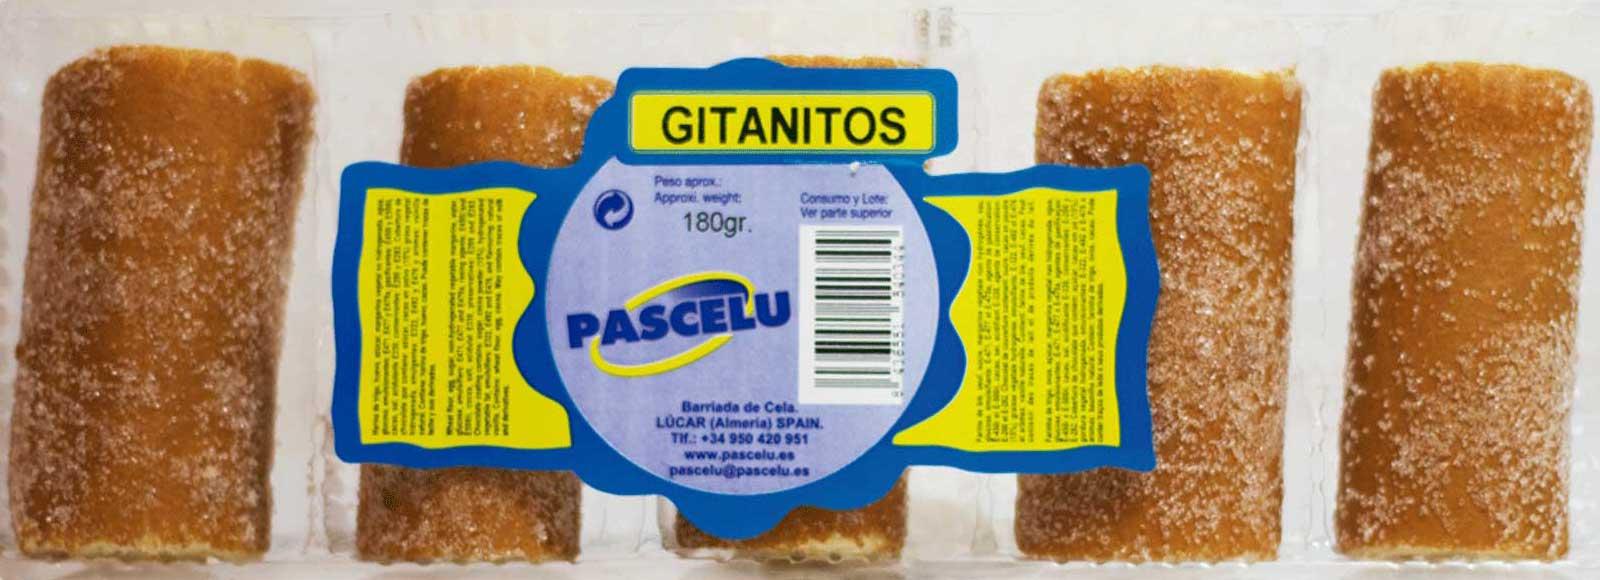 Gitanitos